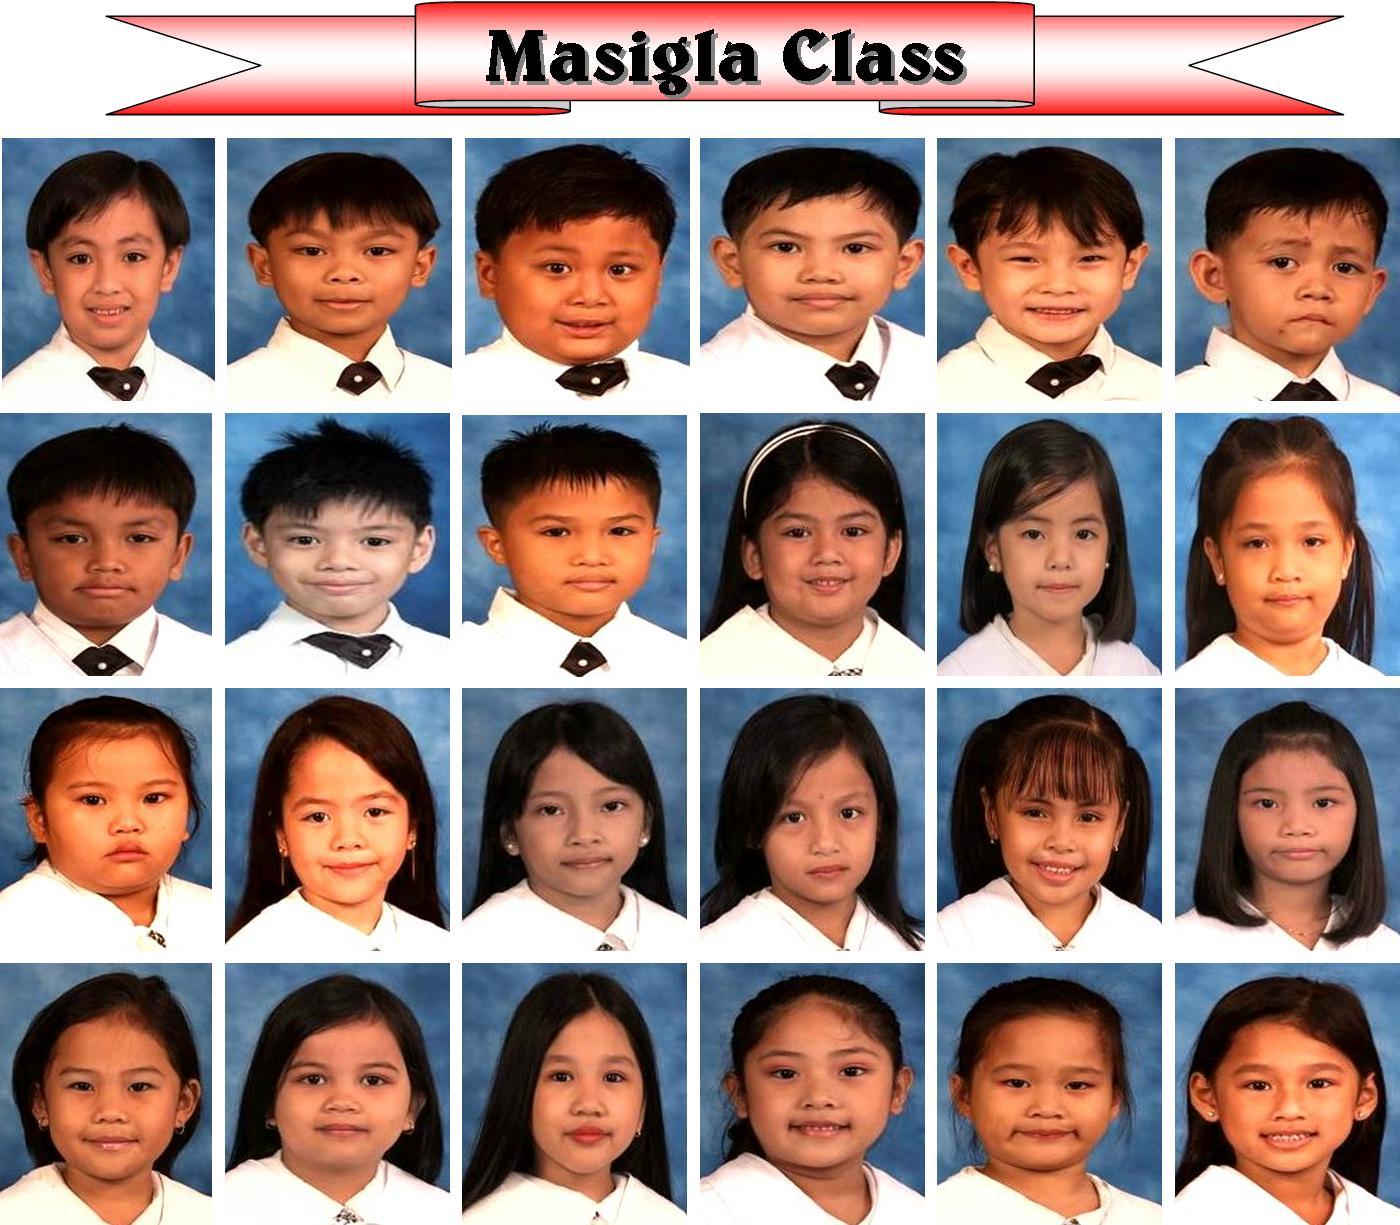 The best of bukas palad volume 2 free bukas nalang kita mamahalin lani misalucha free mp3 bukas palad album